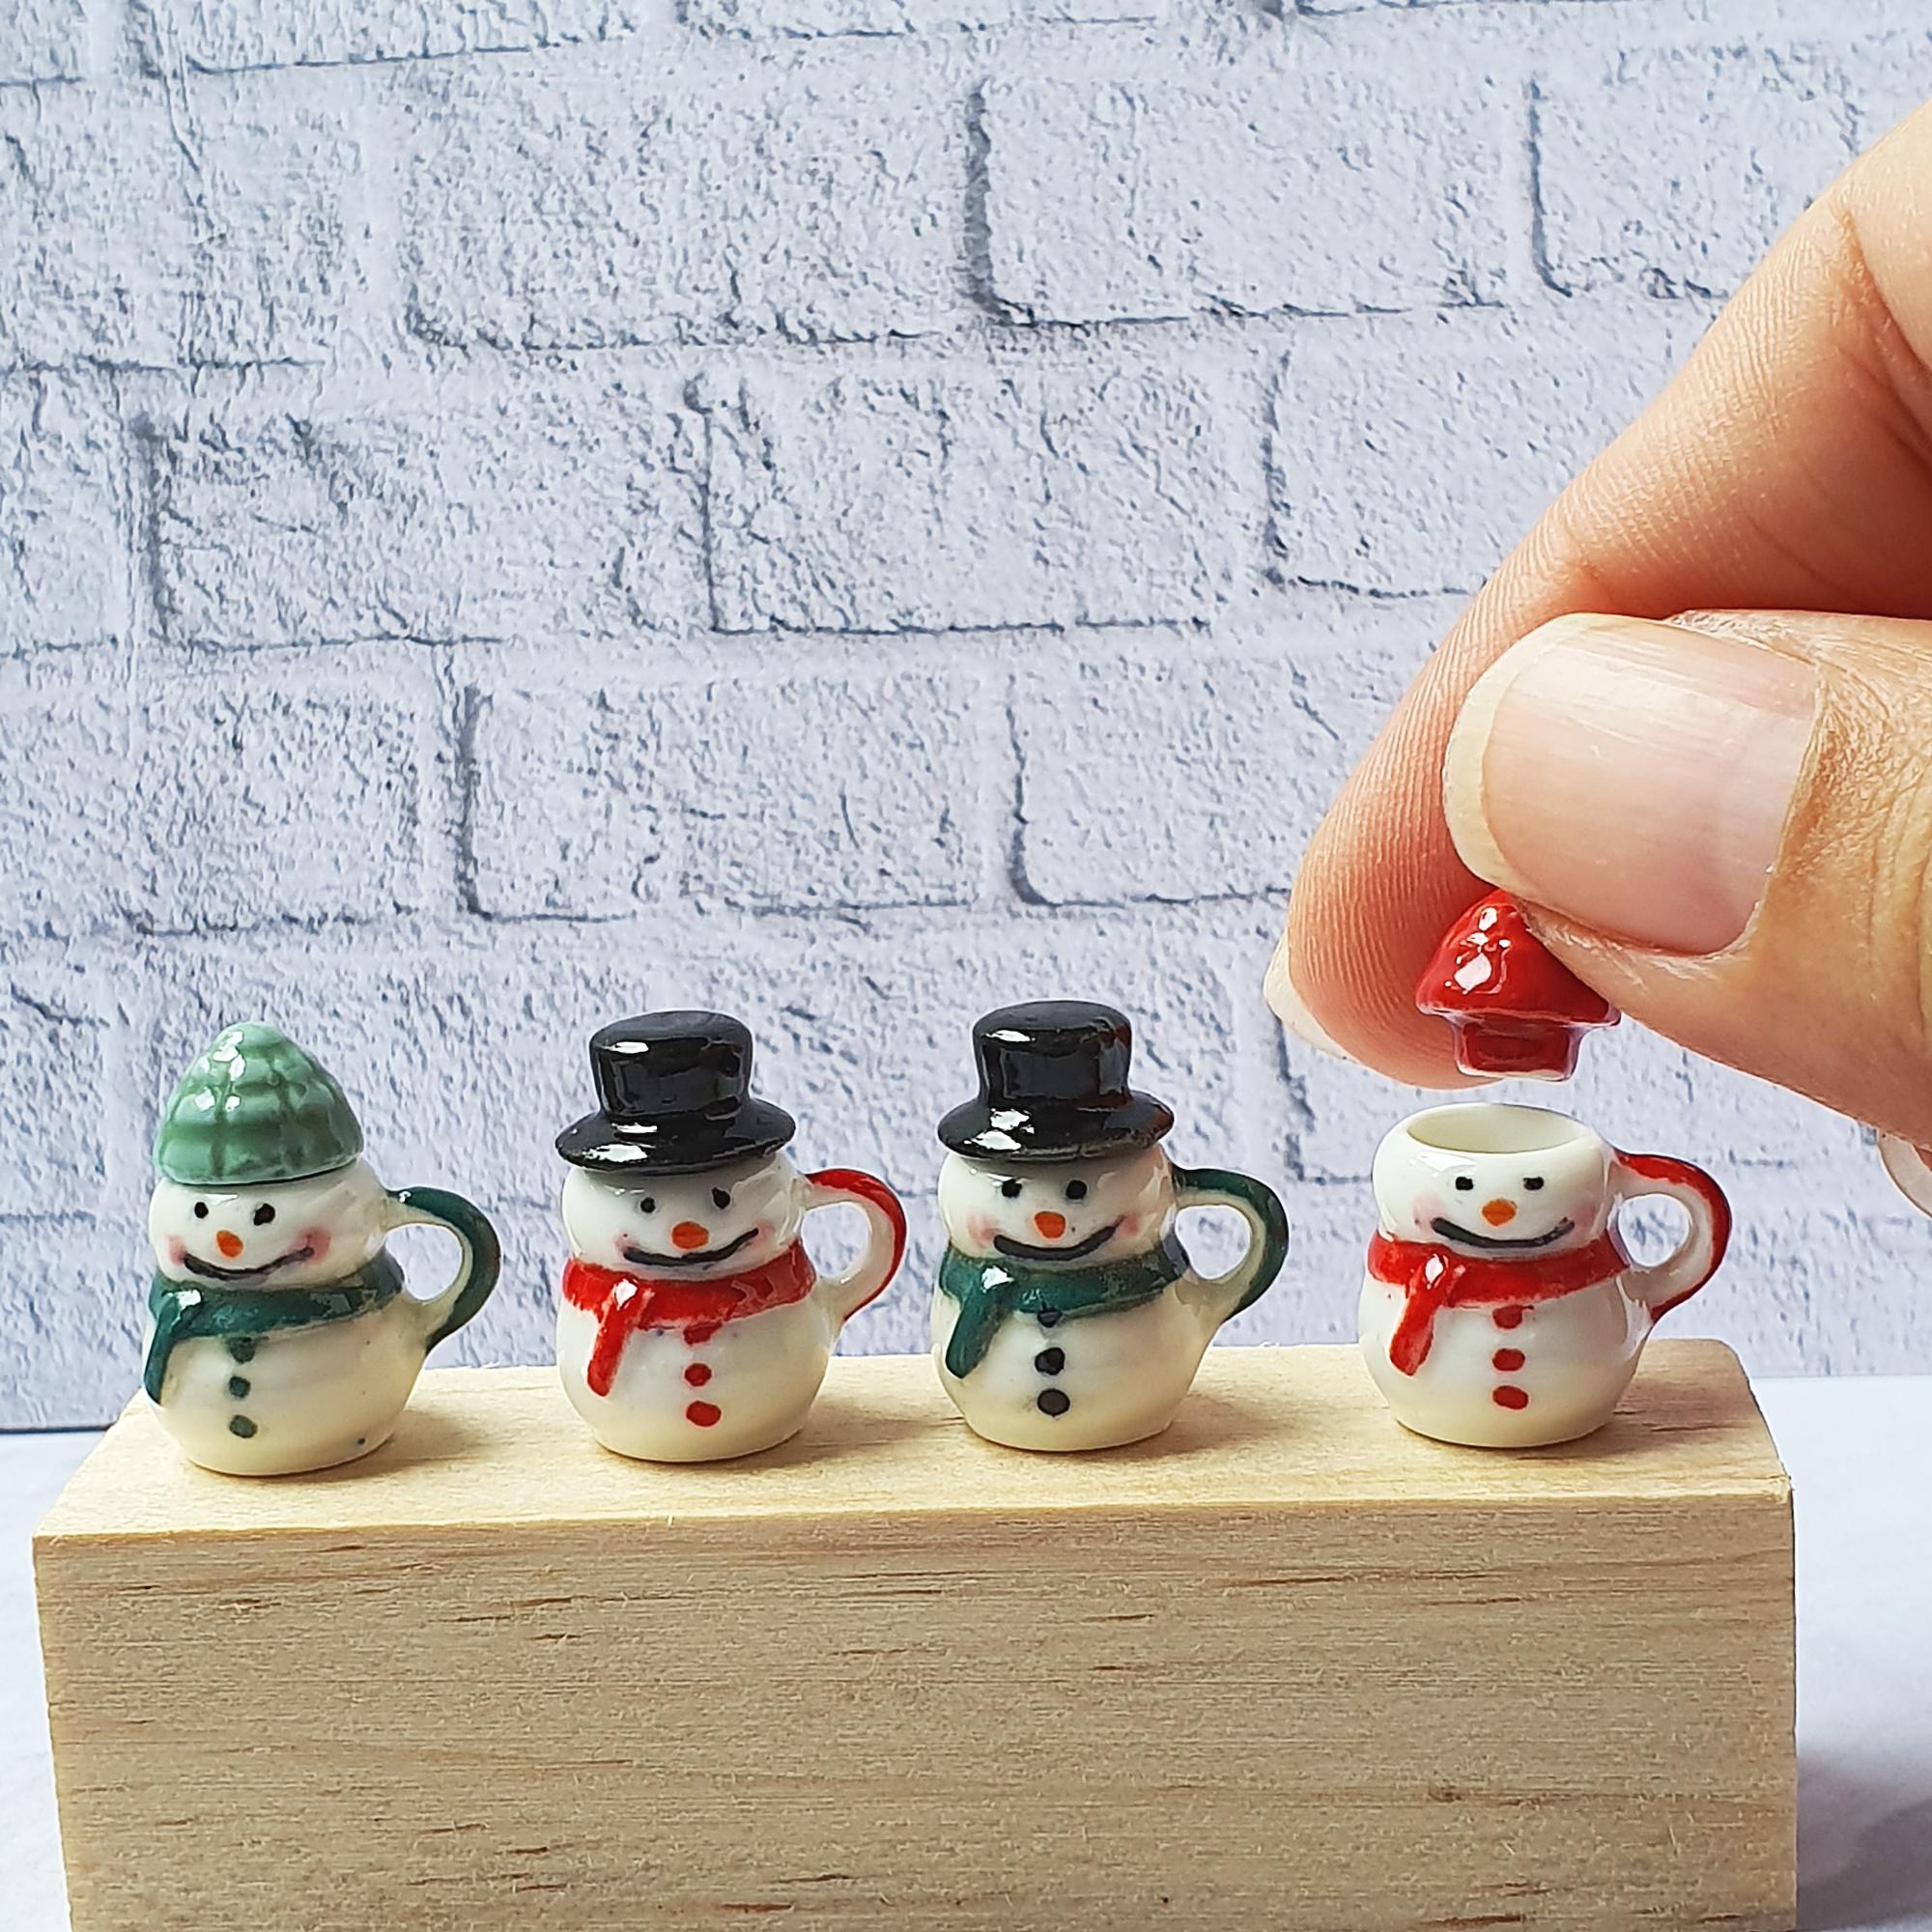 Dollhouse Miniatures Ceramic Snowman Mug Tiny Doll  Christmas Gift Mini Figure Toy